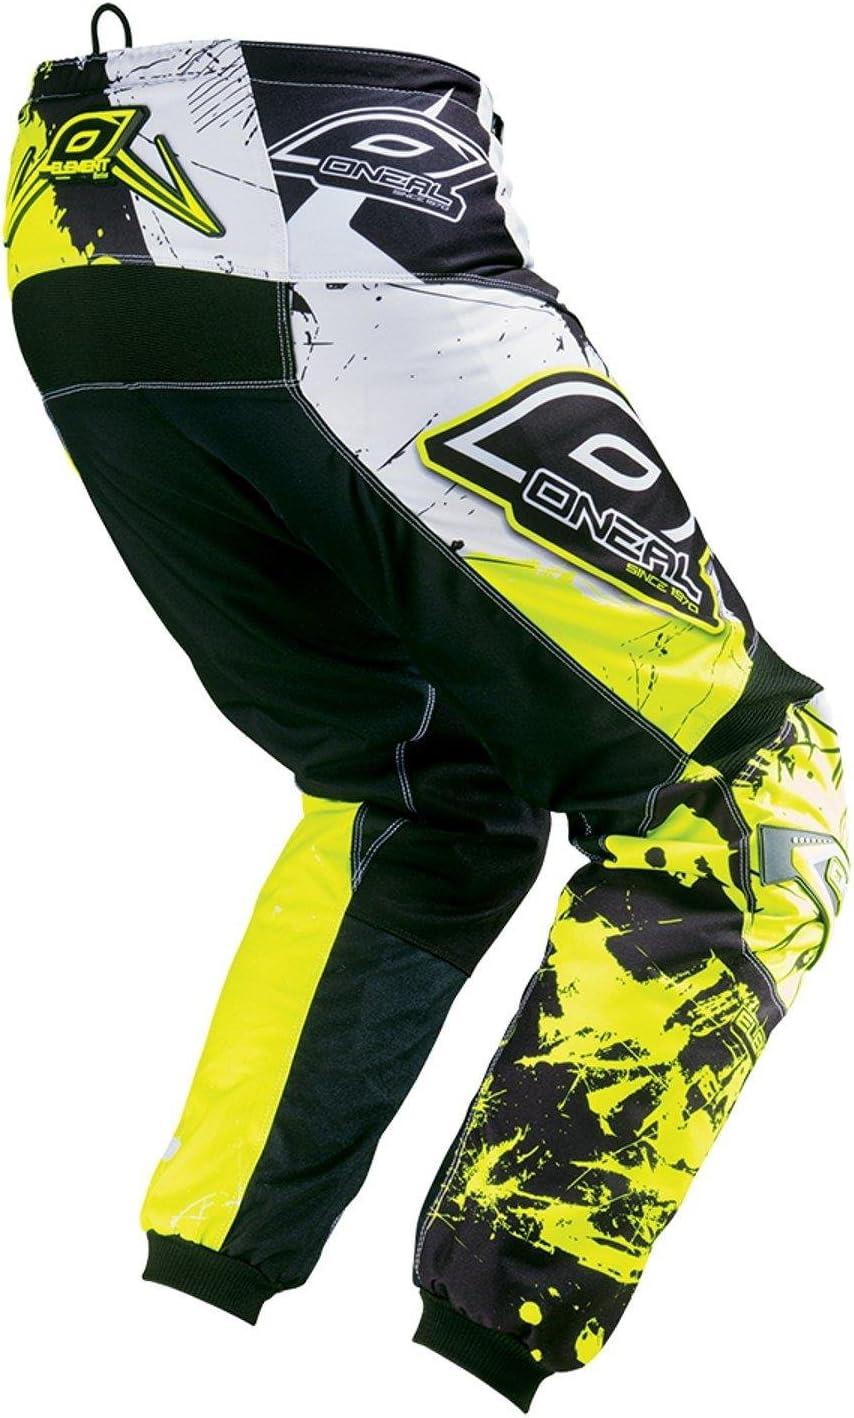 0124S-62 ONeal Element Kinder MX Hose Shocker Neongelb Motocross Enduro Offroad